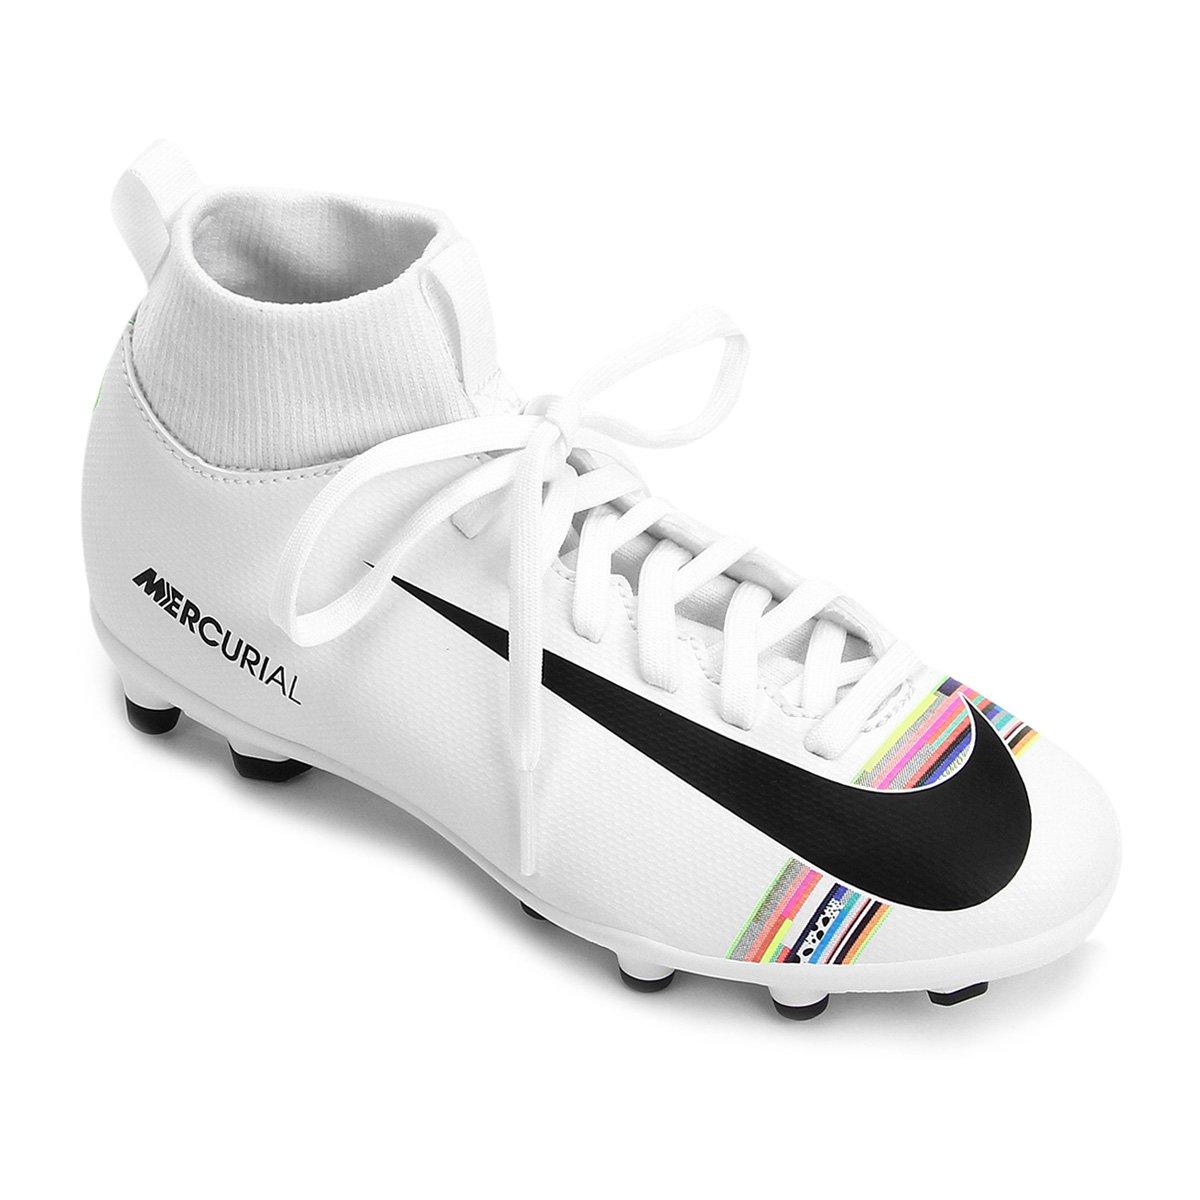 2ba25ad91ae03 Chuteira Campo Infantil Nike Mercurial Superfly 6 Club CR7 FG ...